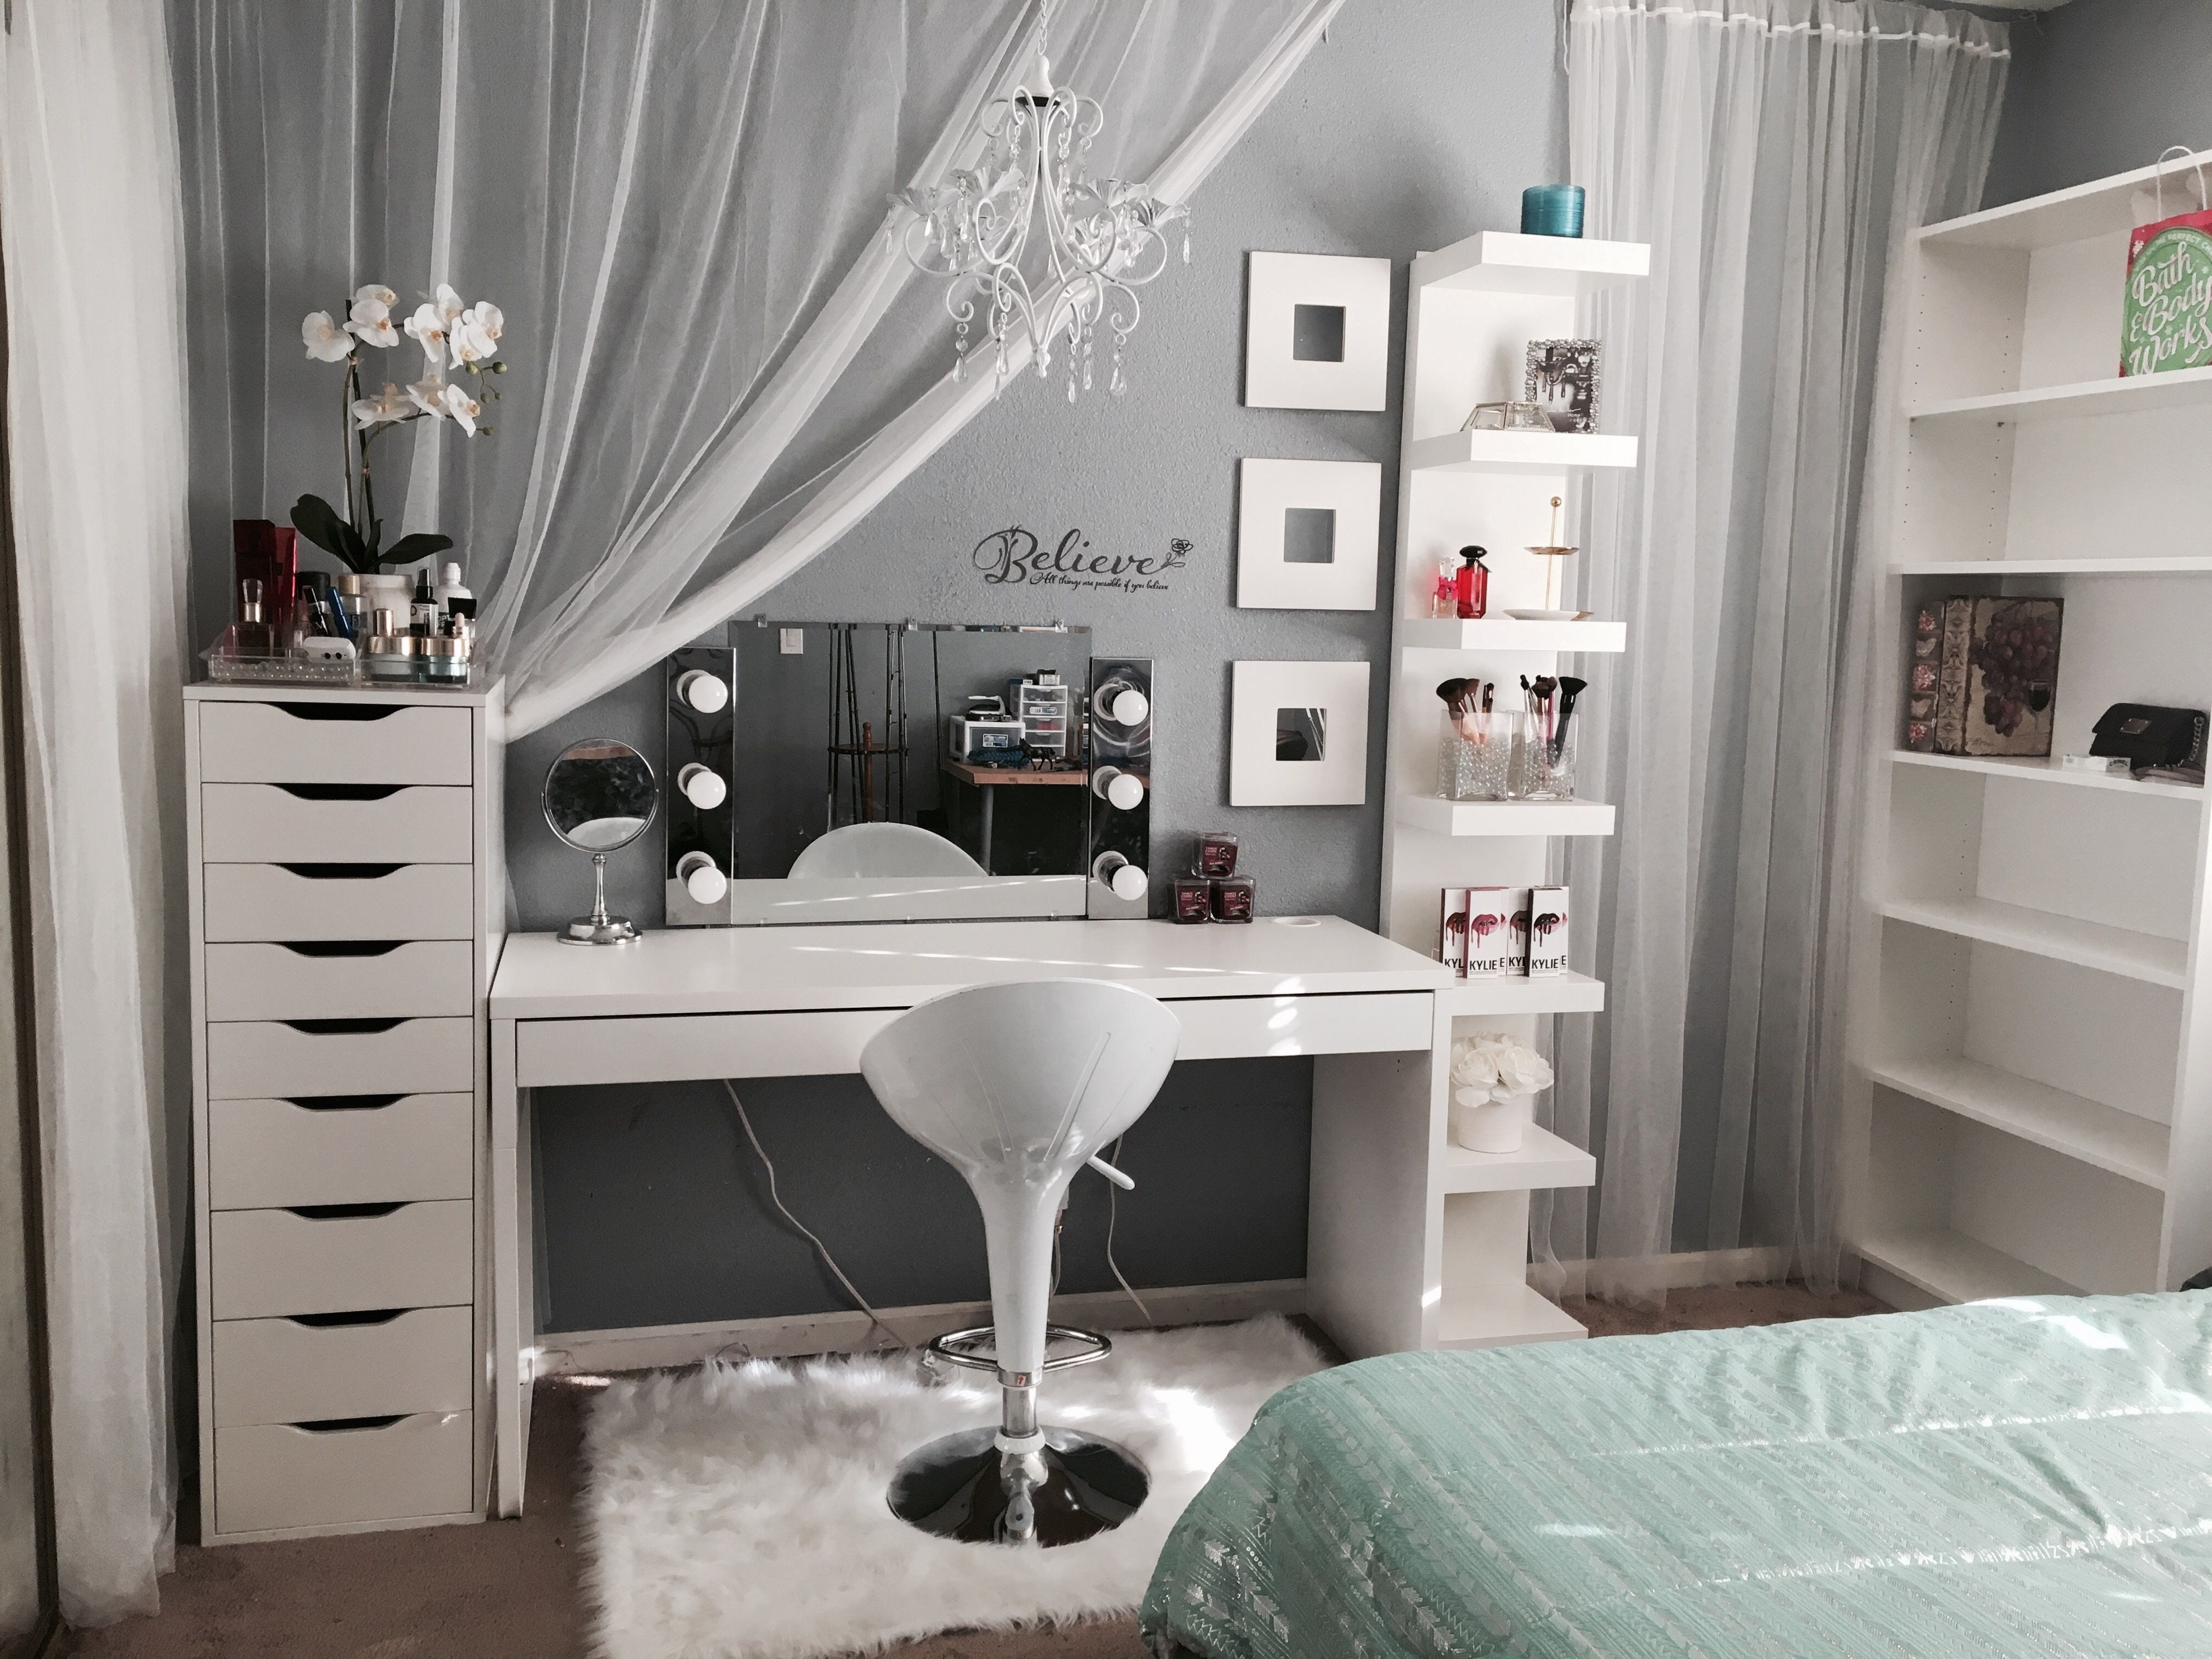 Epingle Sur Modern Home Decoration Ideas